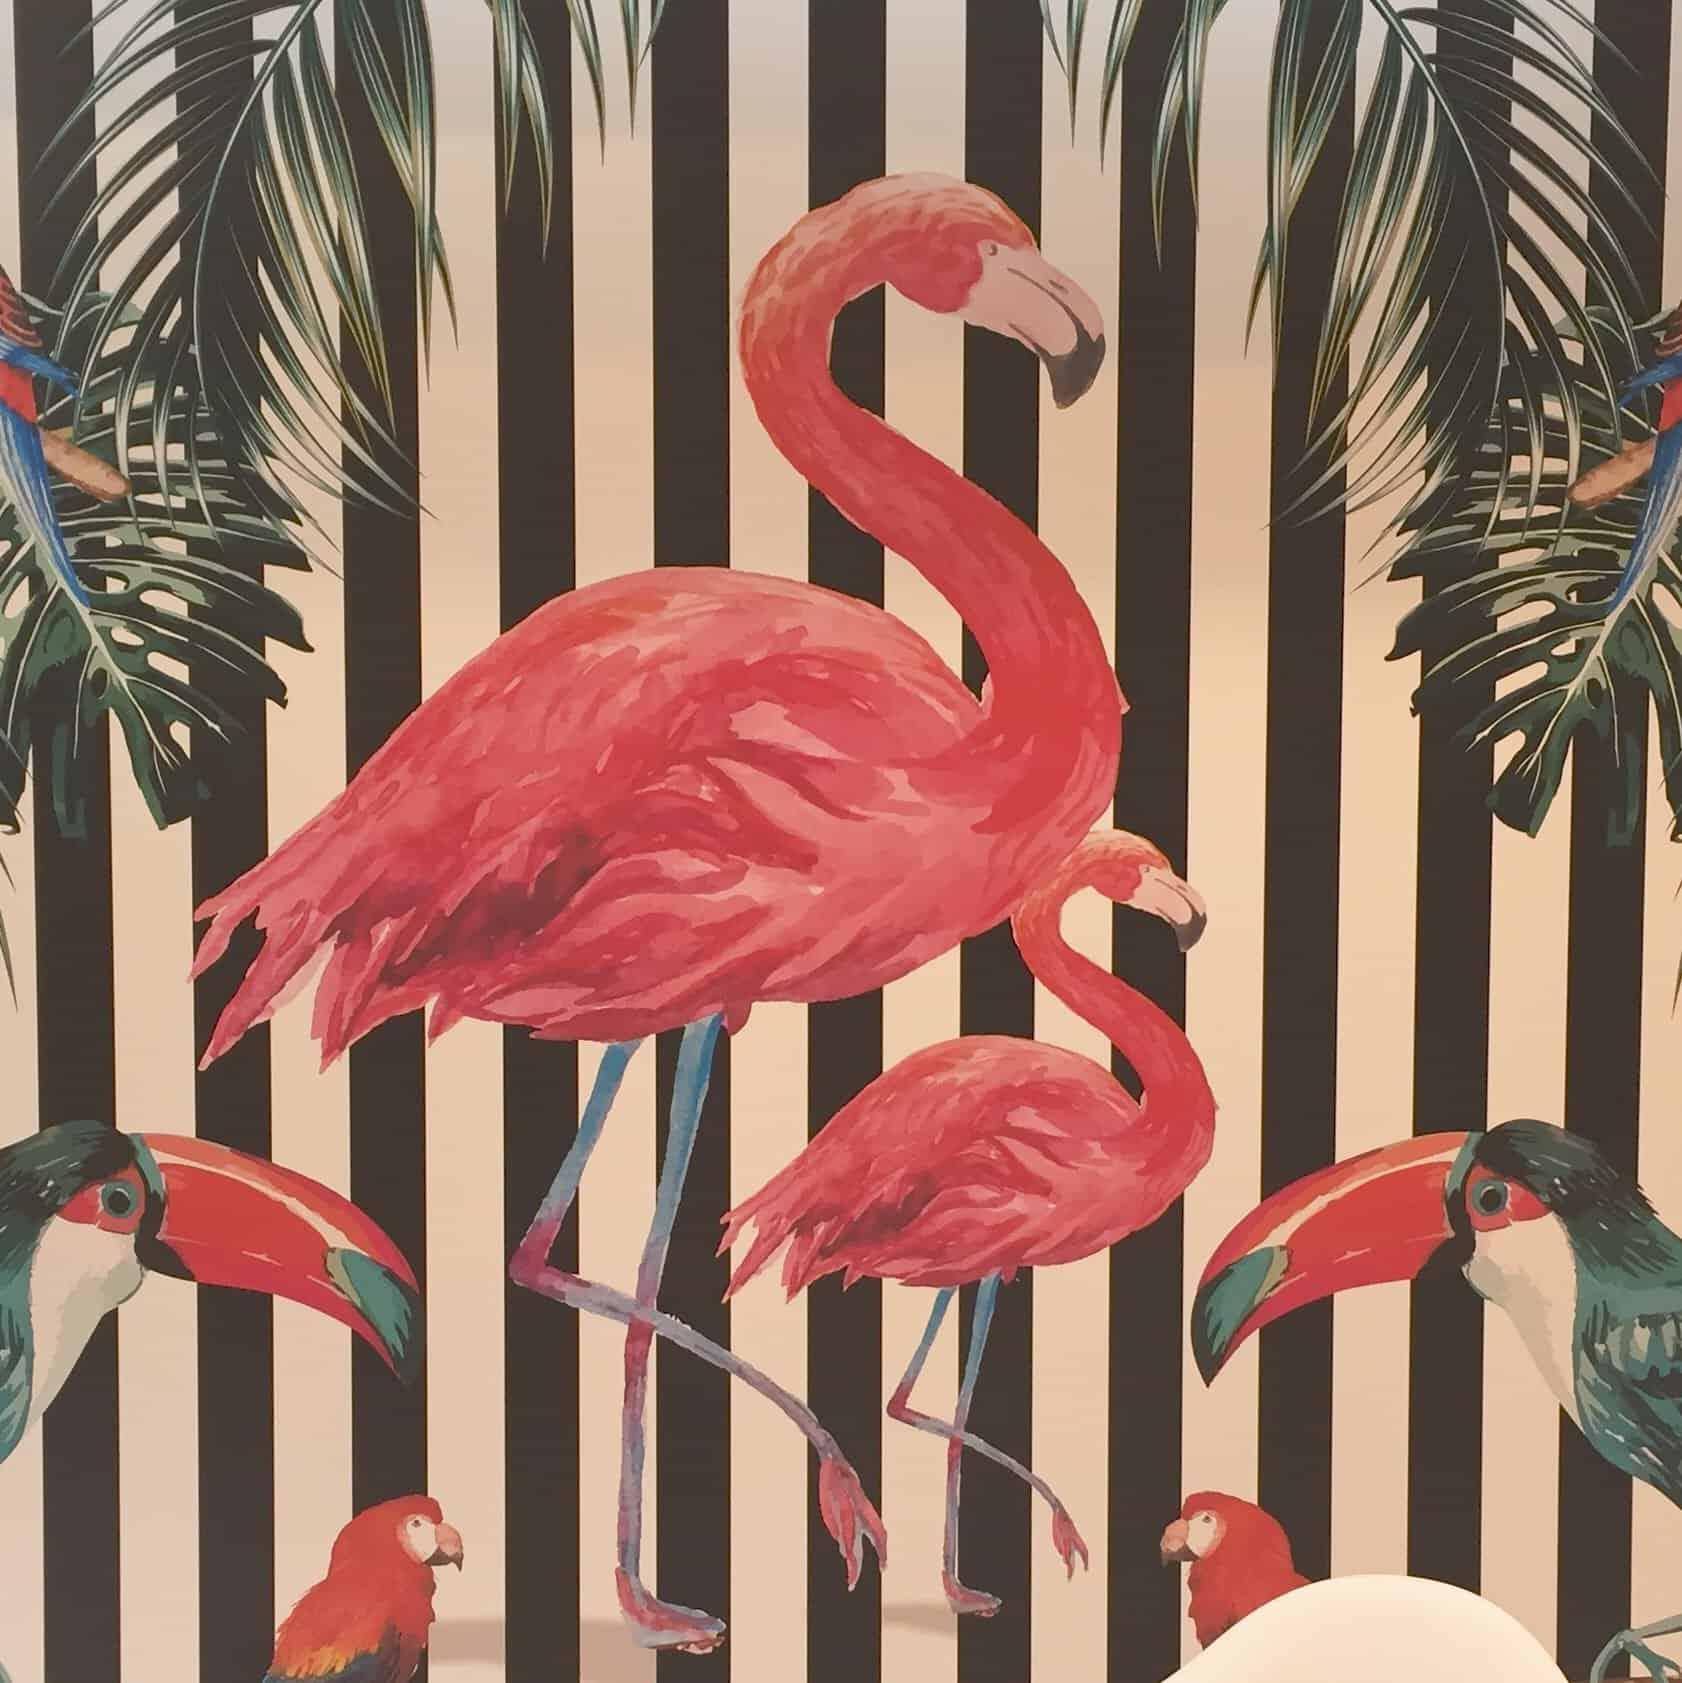 Flamingo mural at the Spring Fair